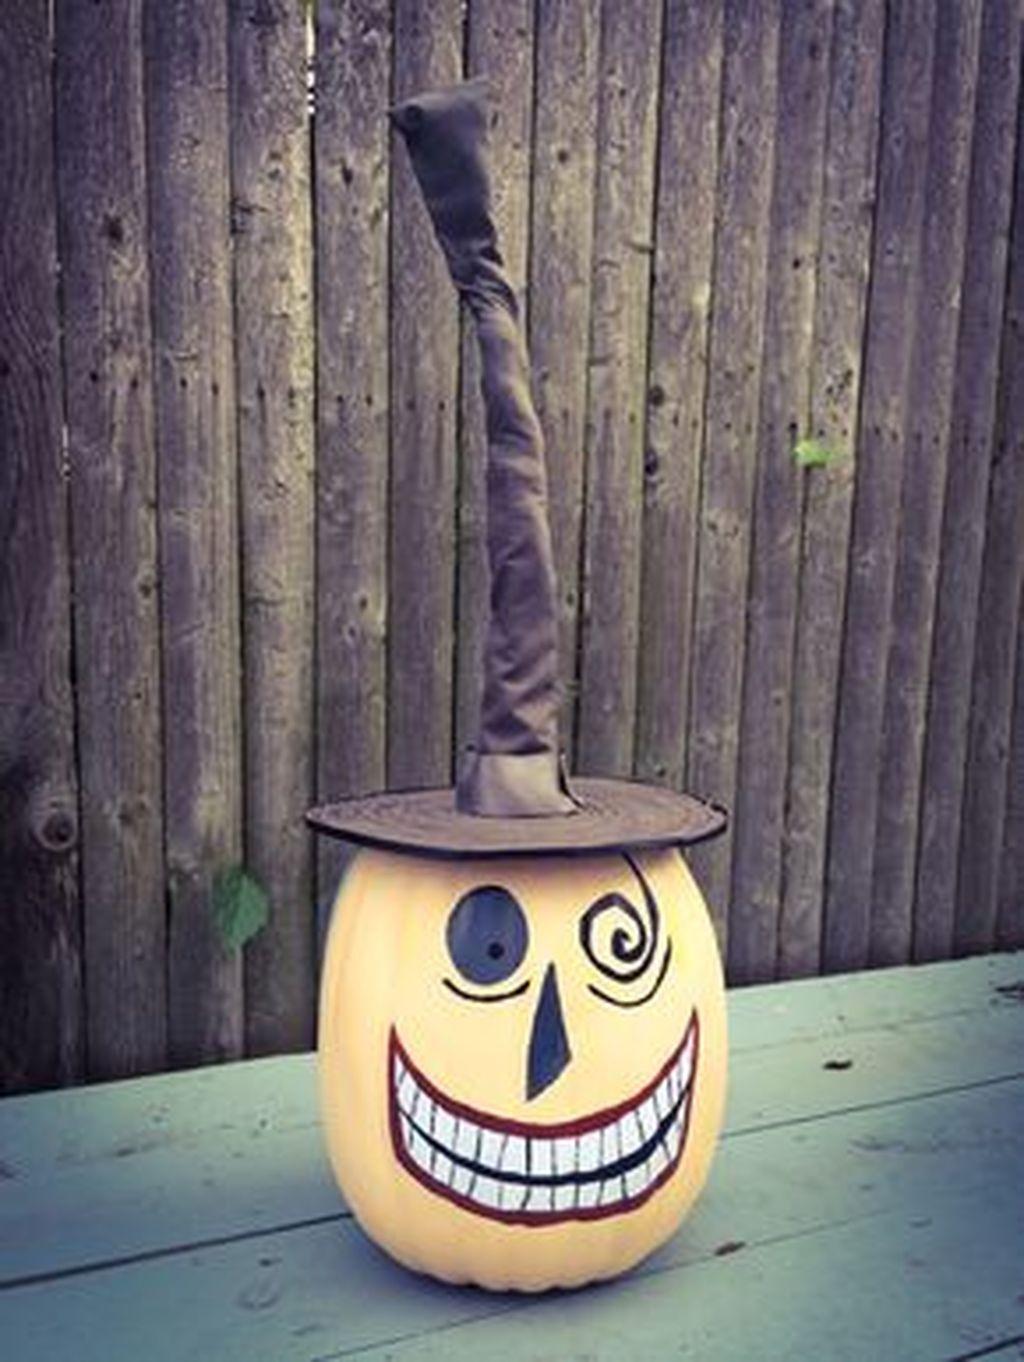 43 Creepy but Cute Disney Themed Halloween Decoration Ideas Decoration - cool halloween decoration ideas